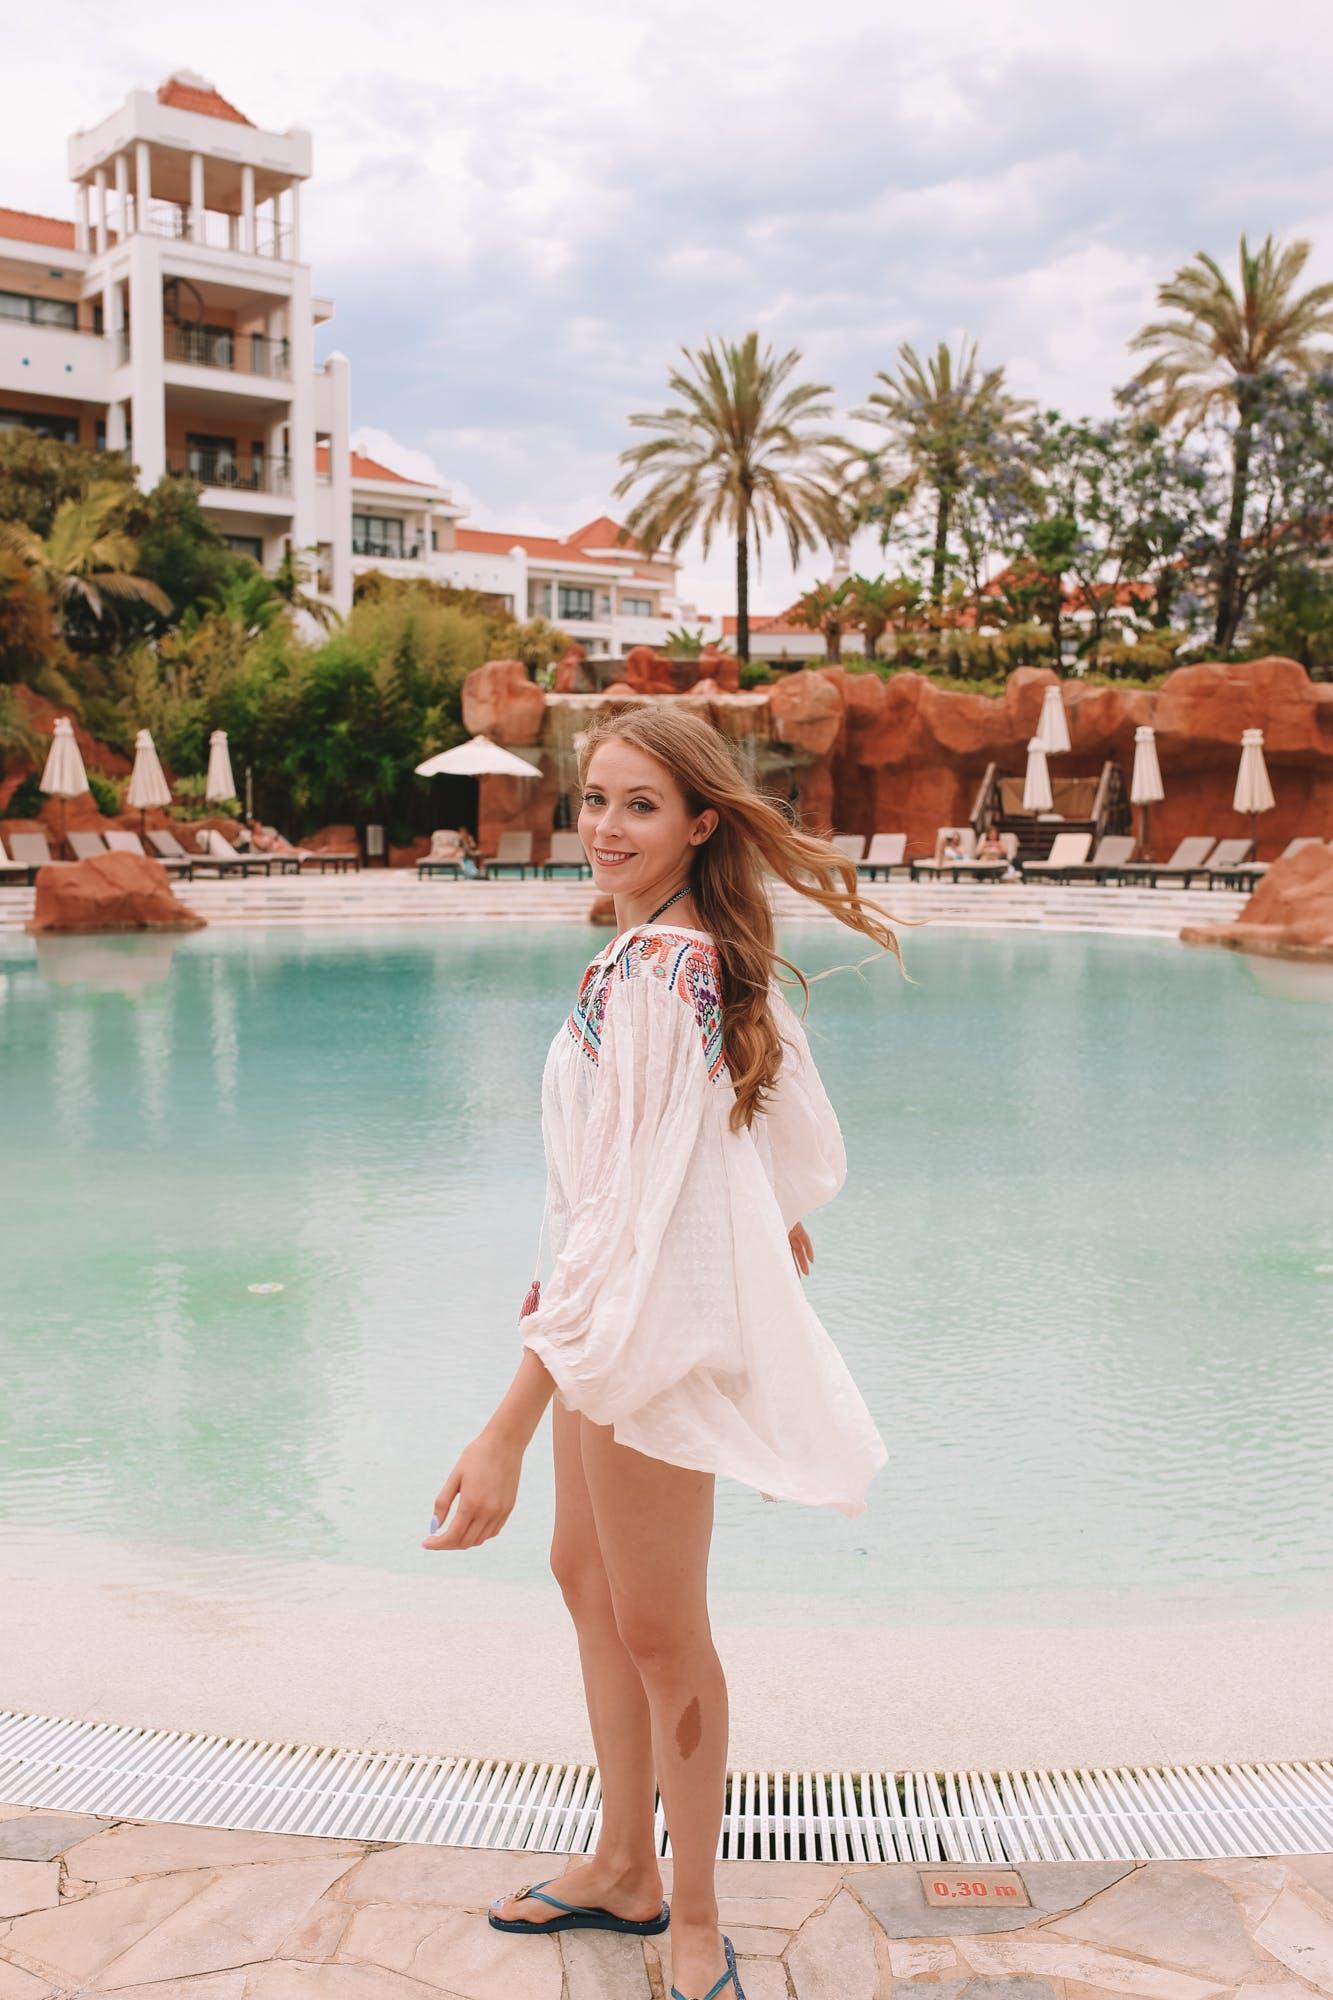 Enjoying the pools at the Hilton Vilamoura As Cascatas Golf Resort & Spa